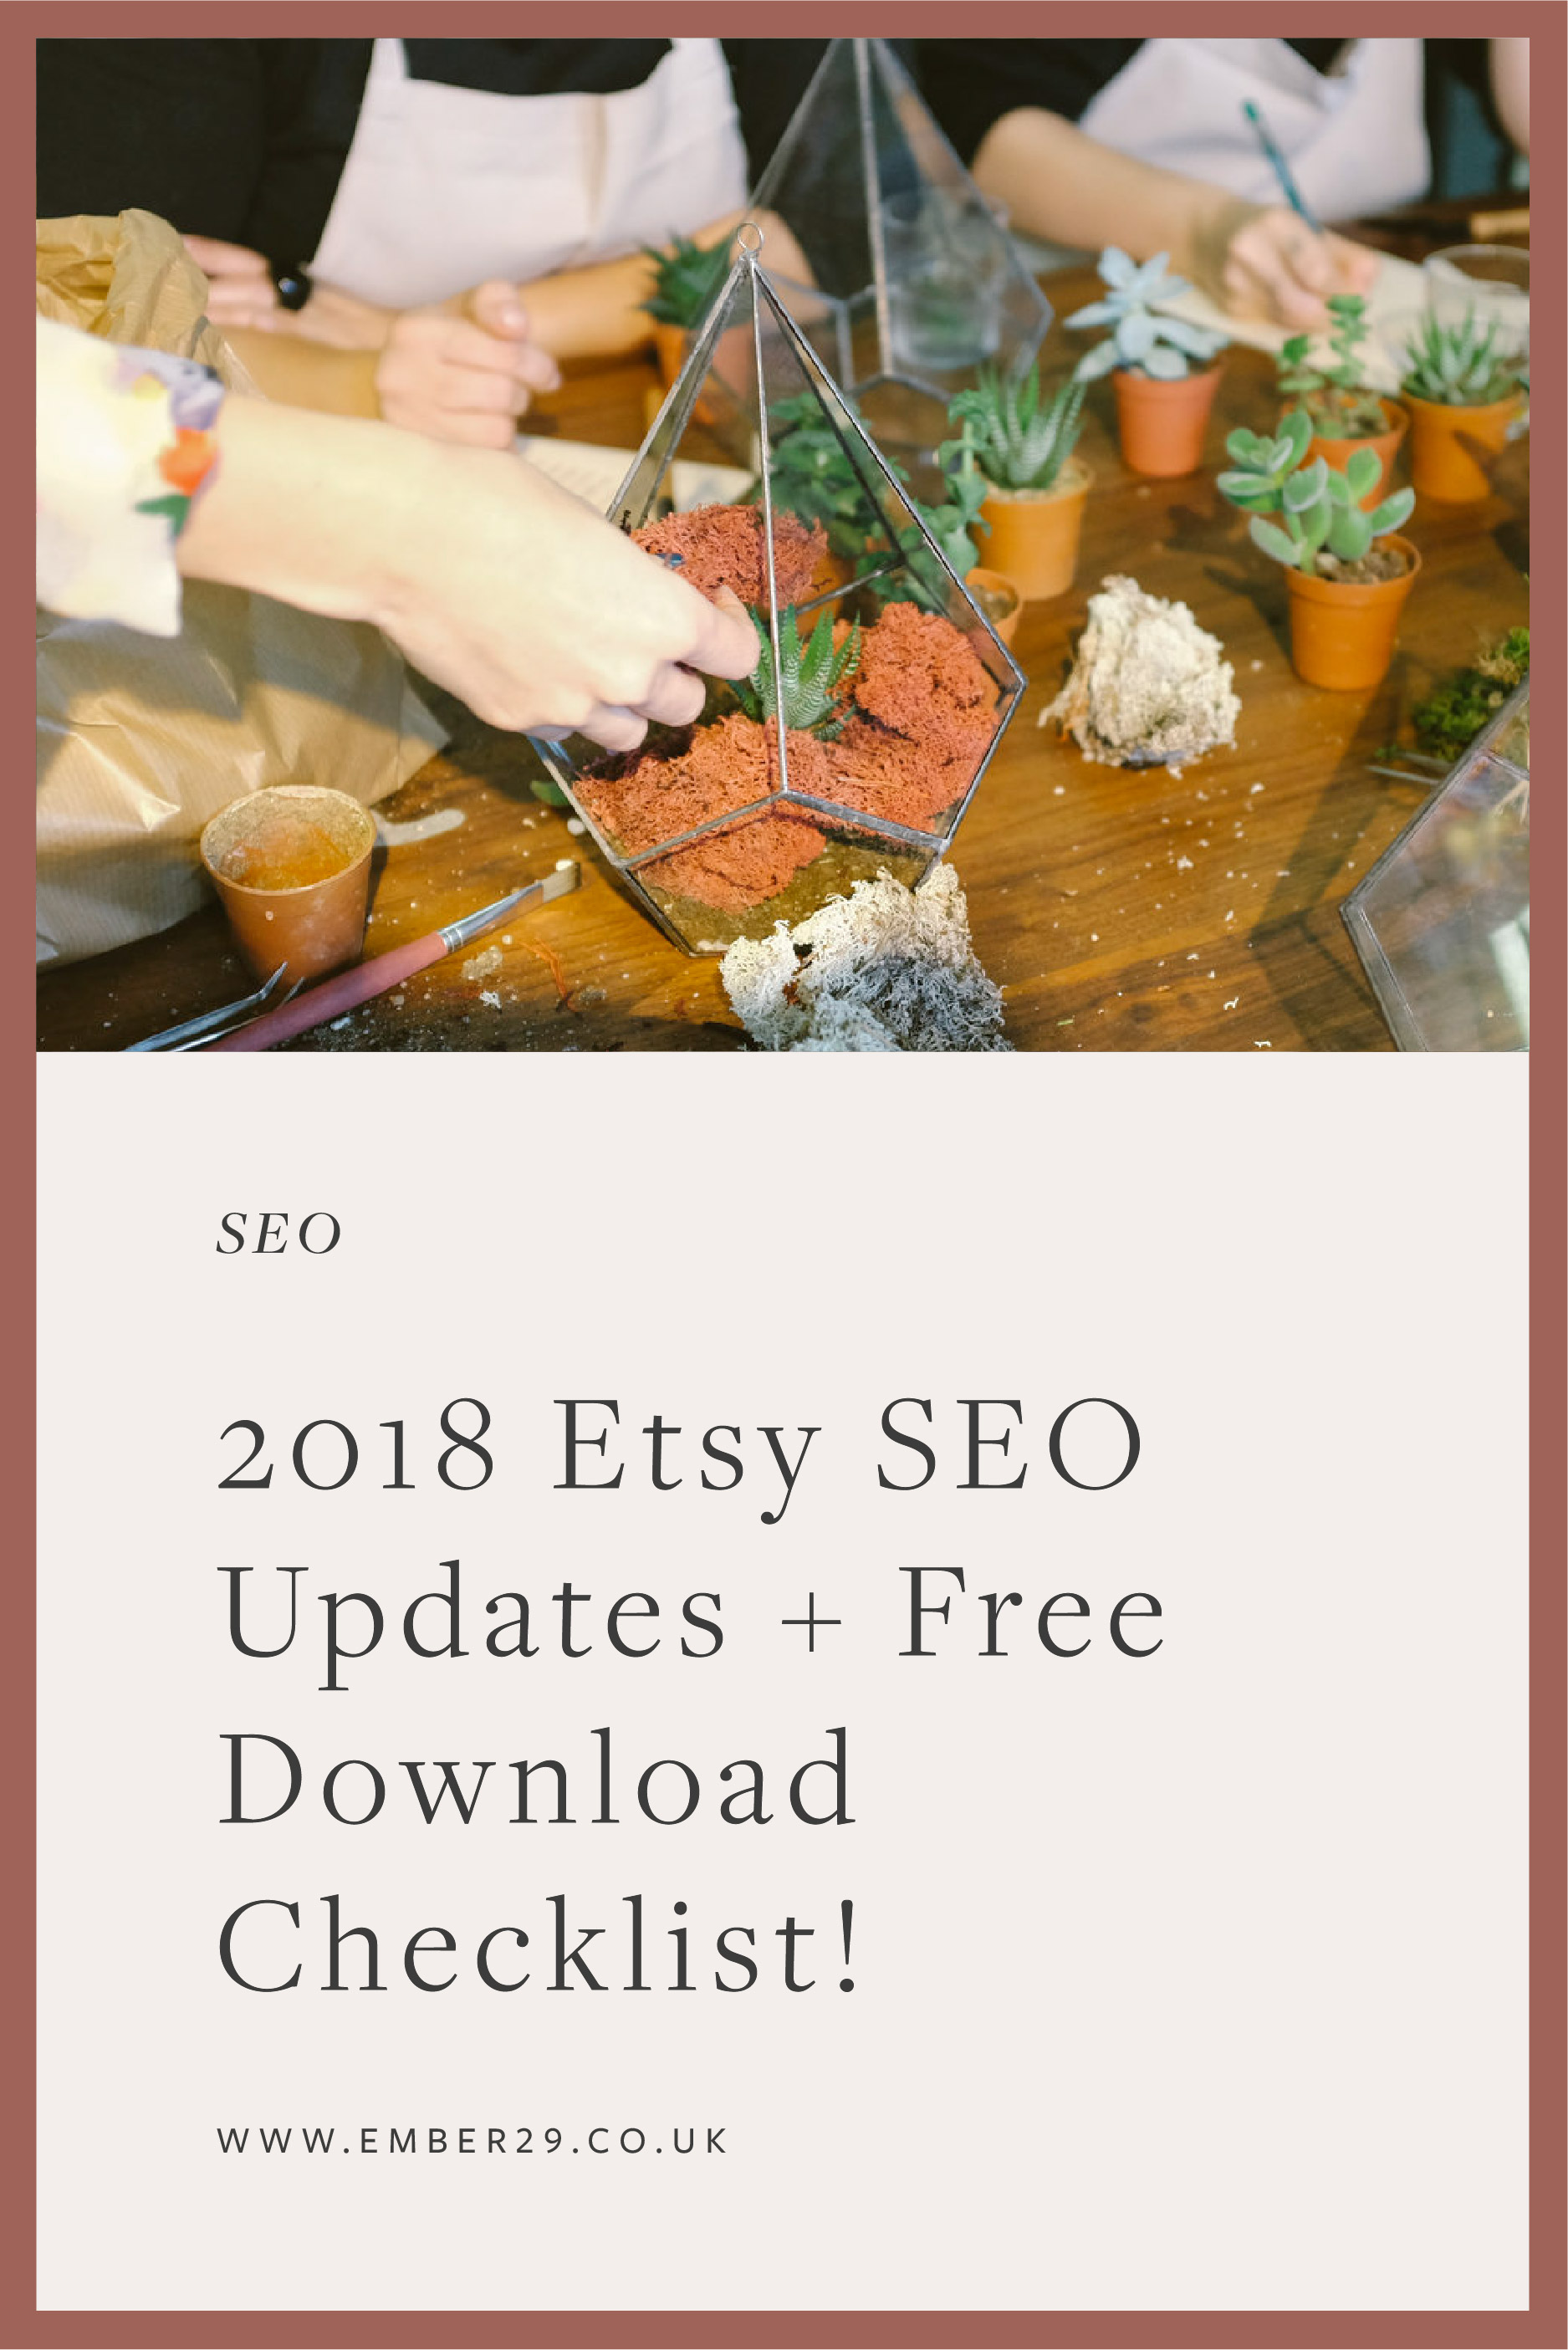 2018 Etsy SEO Updates + Free Download Checklist!